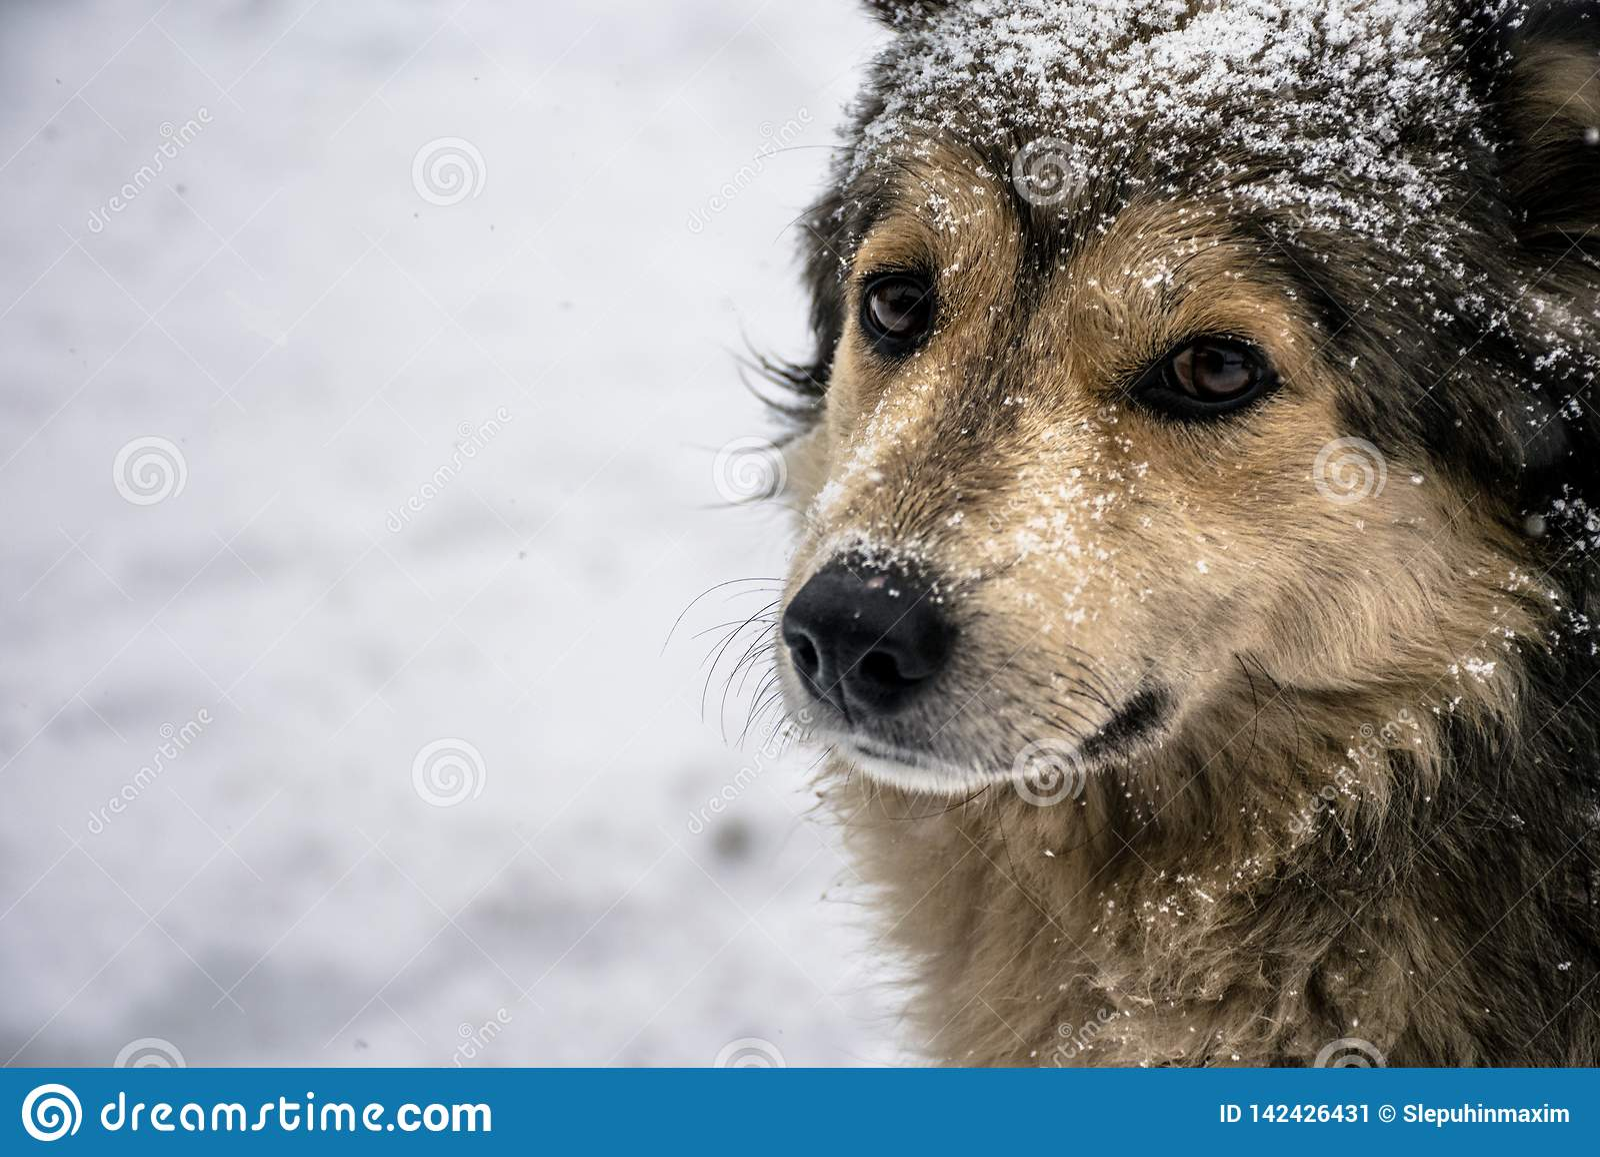 Portrait of a cute dog with kind sad eyes